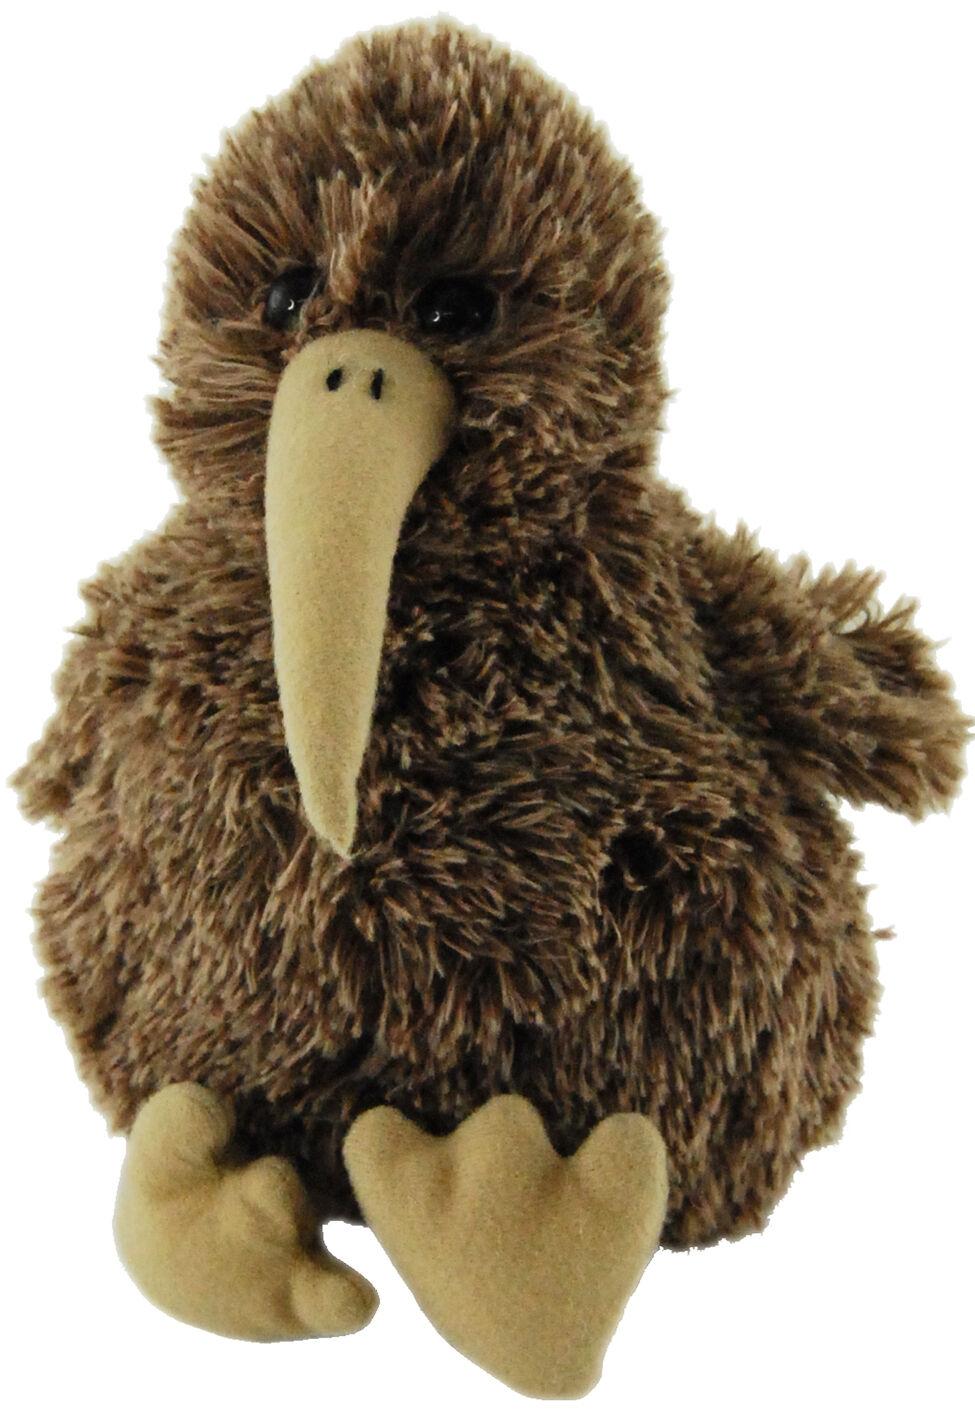 New Cute Sitting New Zealand Nz Kiwi Bird Soft Soft Bird Plush Toy